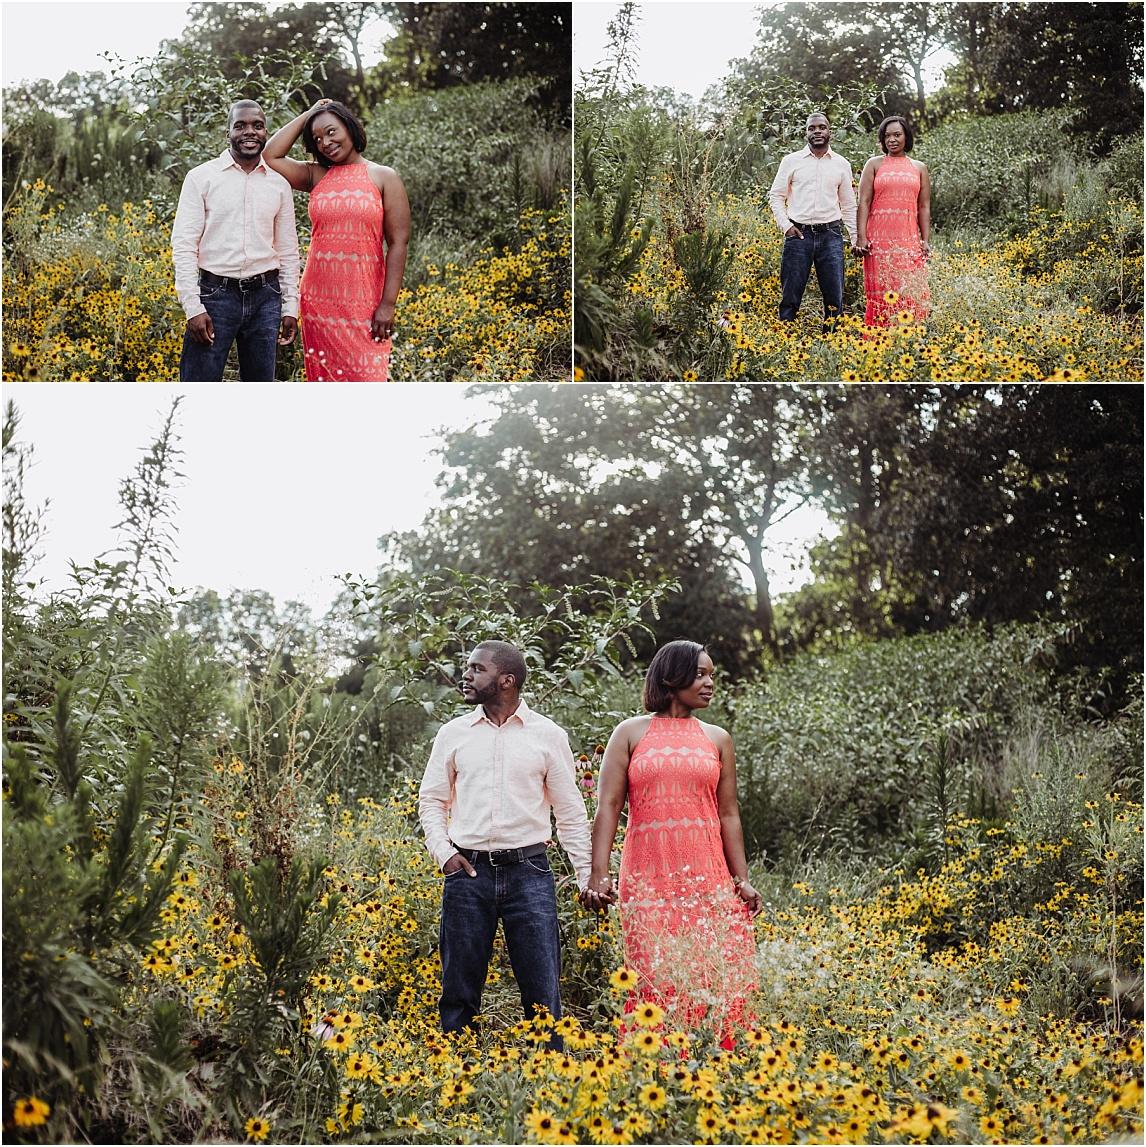 Posh-Moments-Photography-NC- Wedding-Photographer-Rolling-Hills-Farms-Wedding-Monroe-NC-Charlotte-NC_0046.jpg